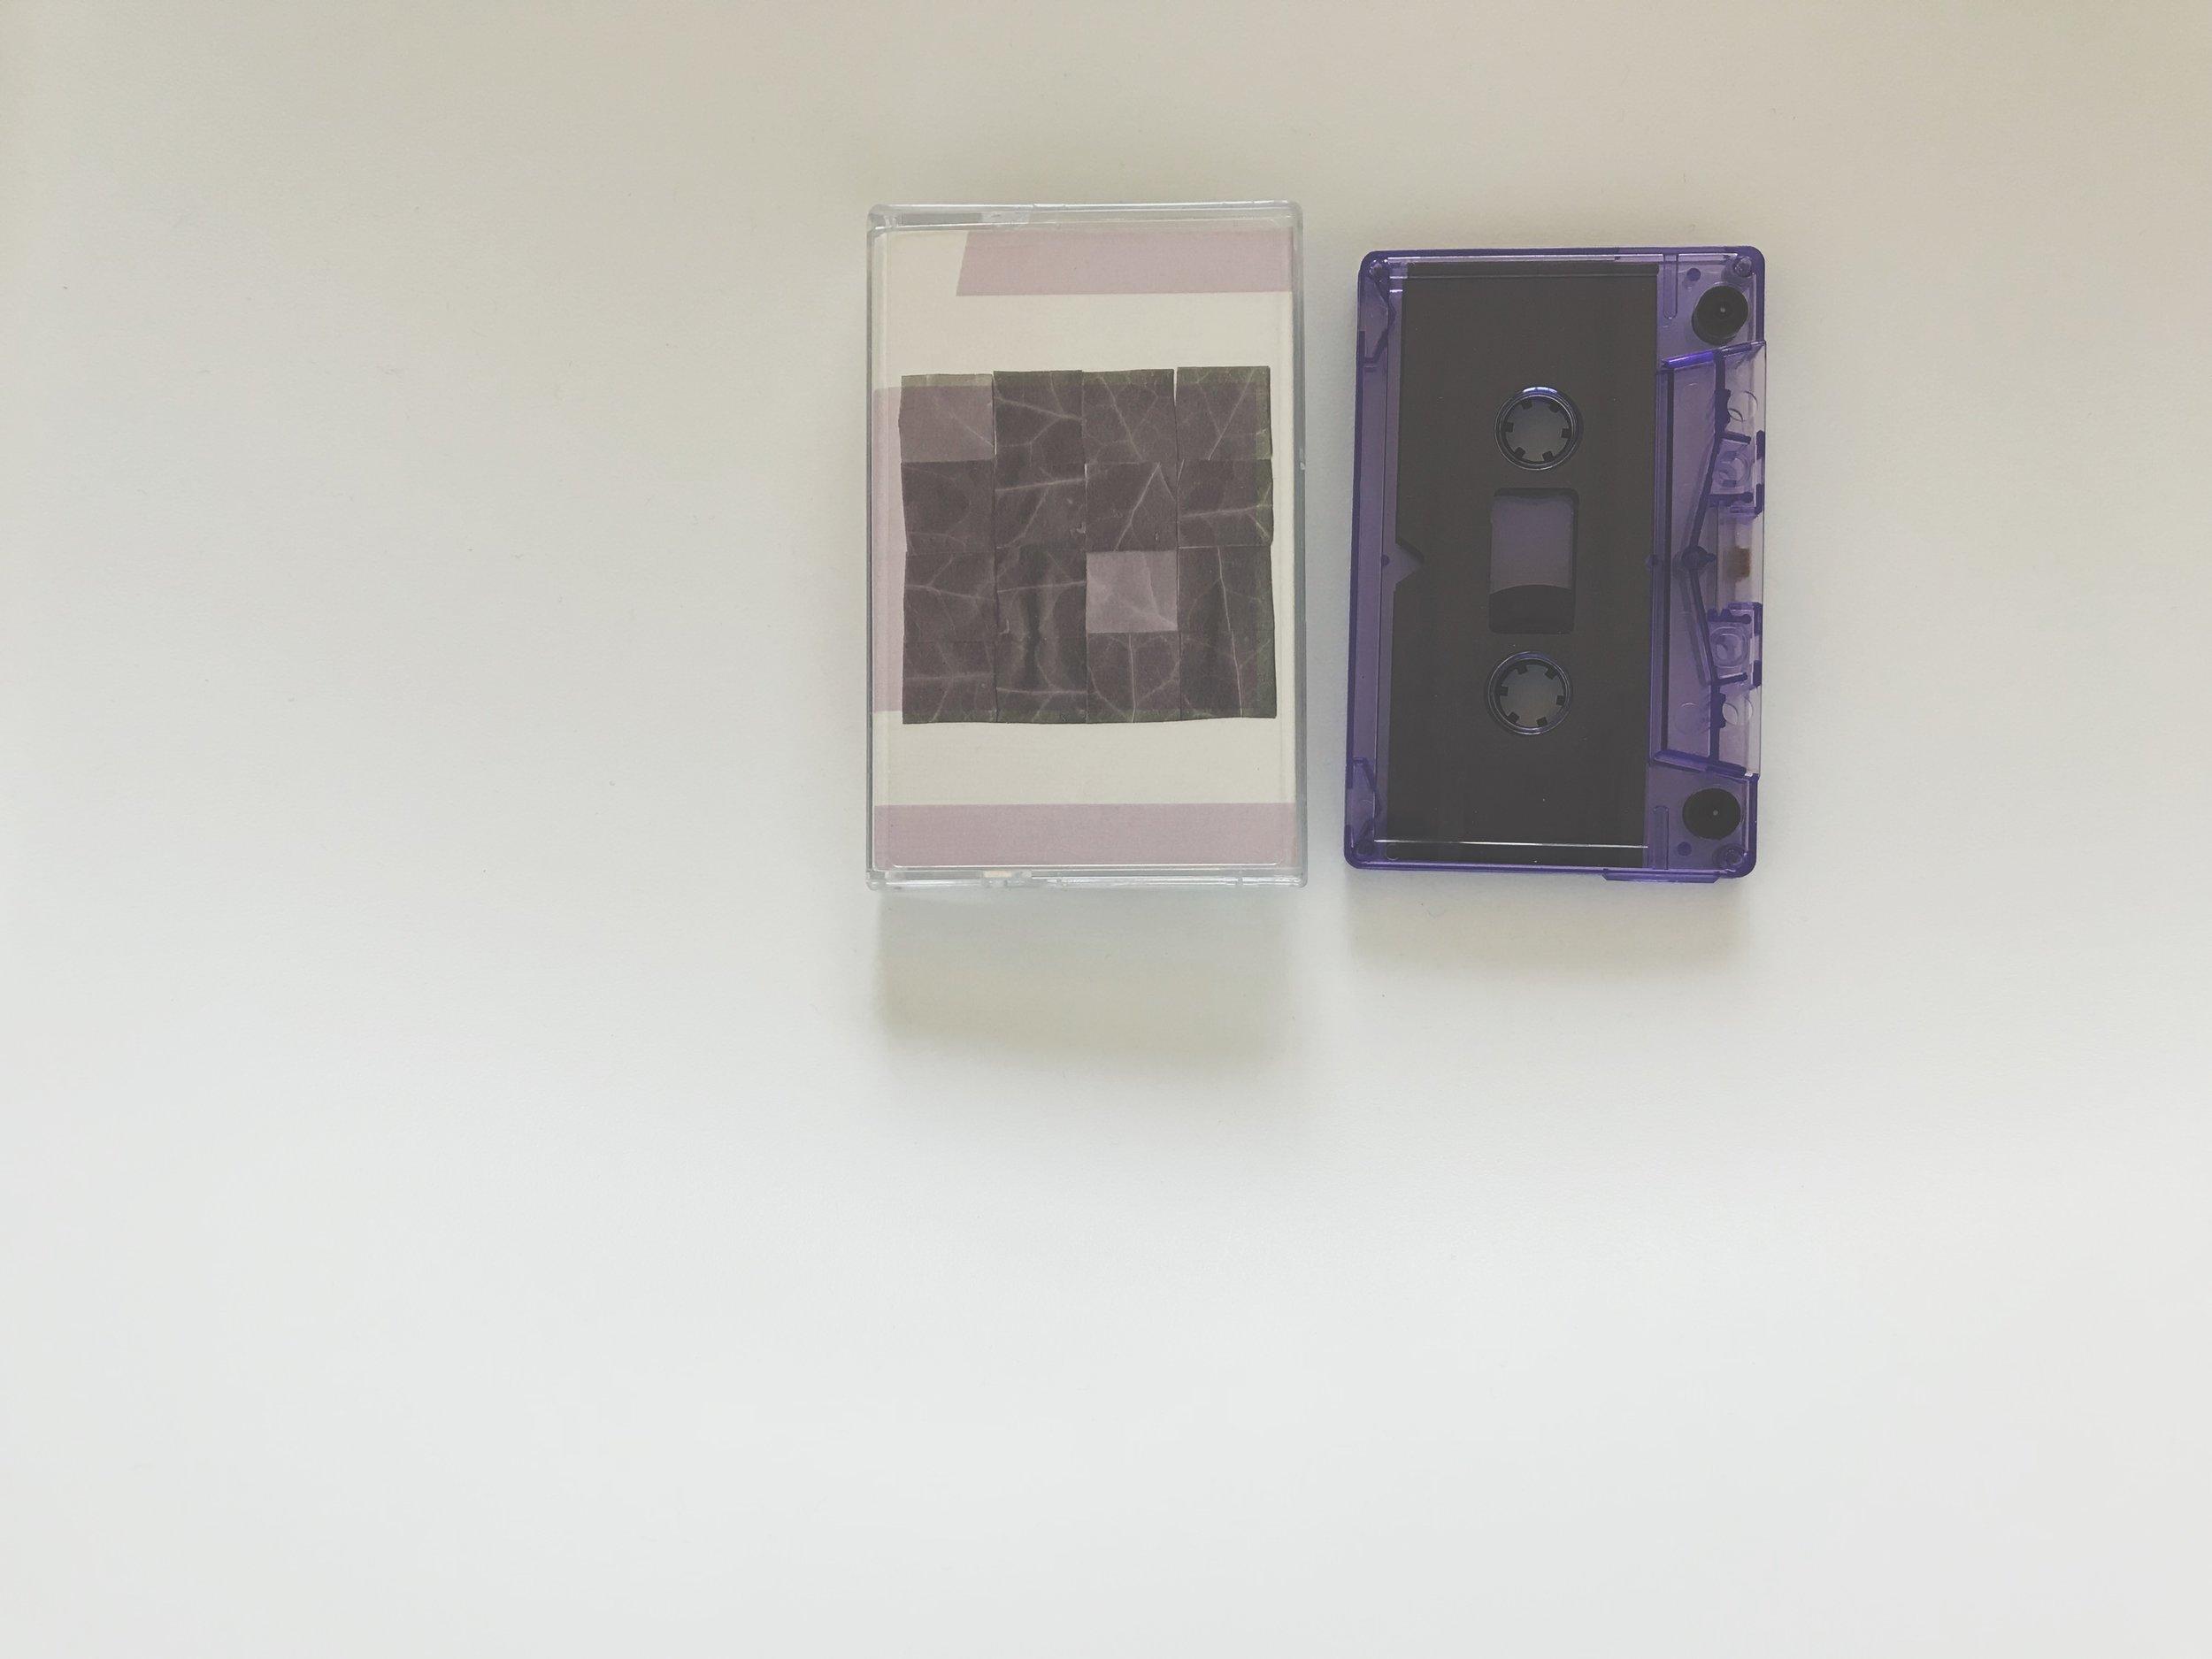 Tüth / Heinali -Heteroticisms Volume 1 (Land Animal Tapes / Kotaktu Collective)